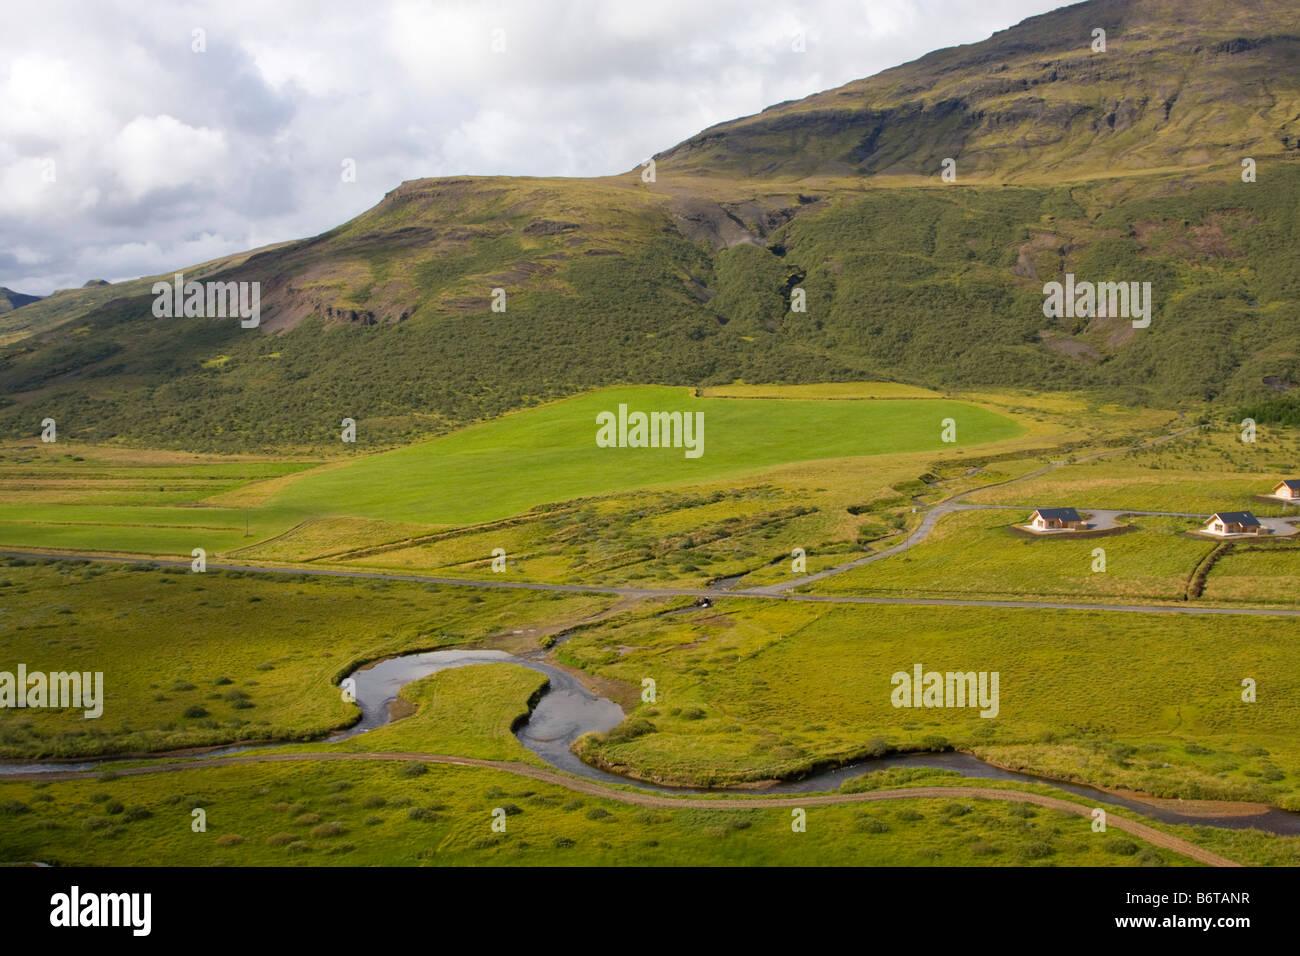 Landscape at Geysir Iceland - Stock Image